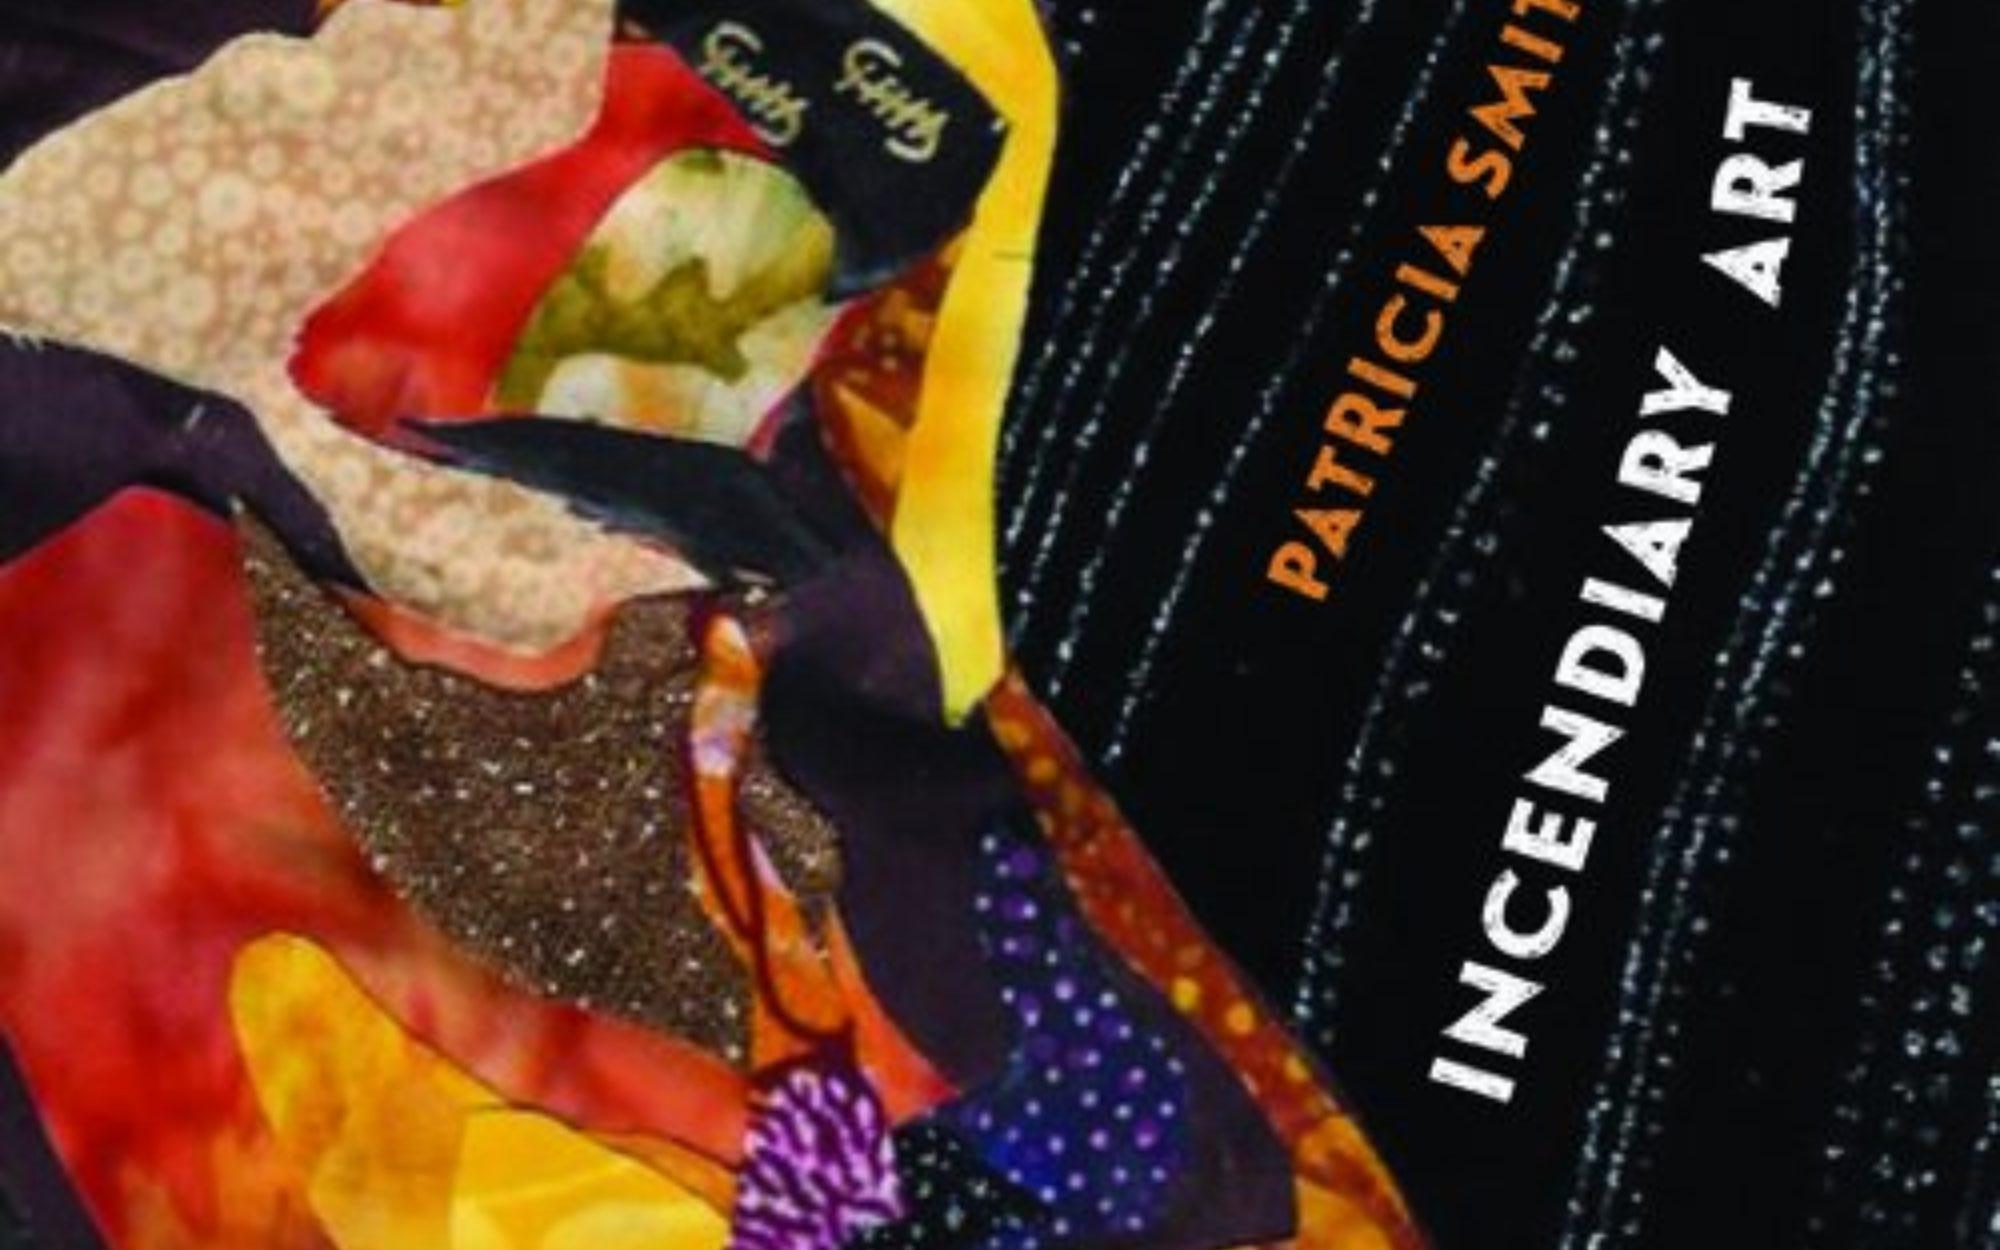 Patricia Smith's Incendiary Art